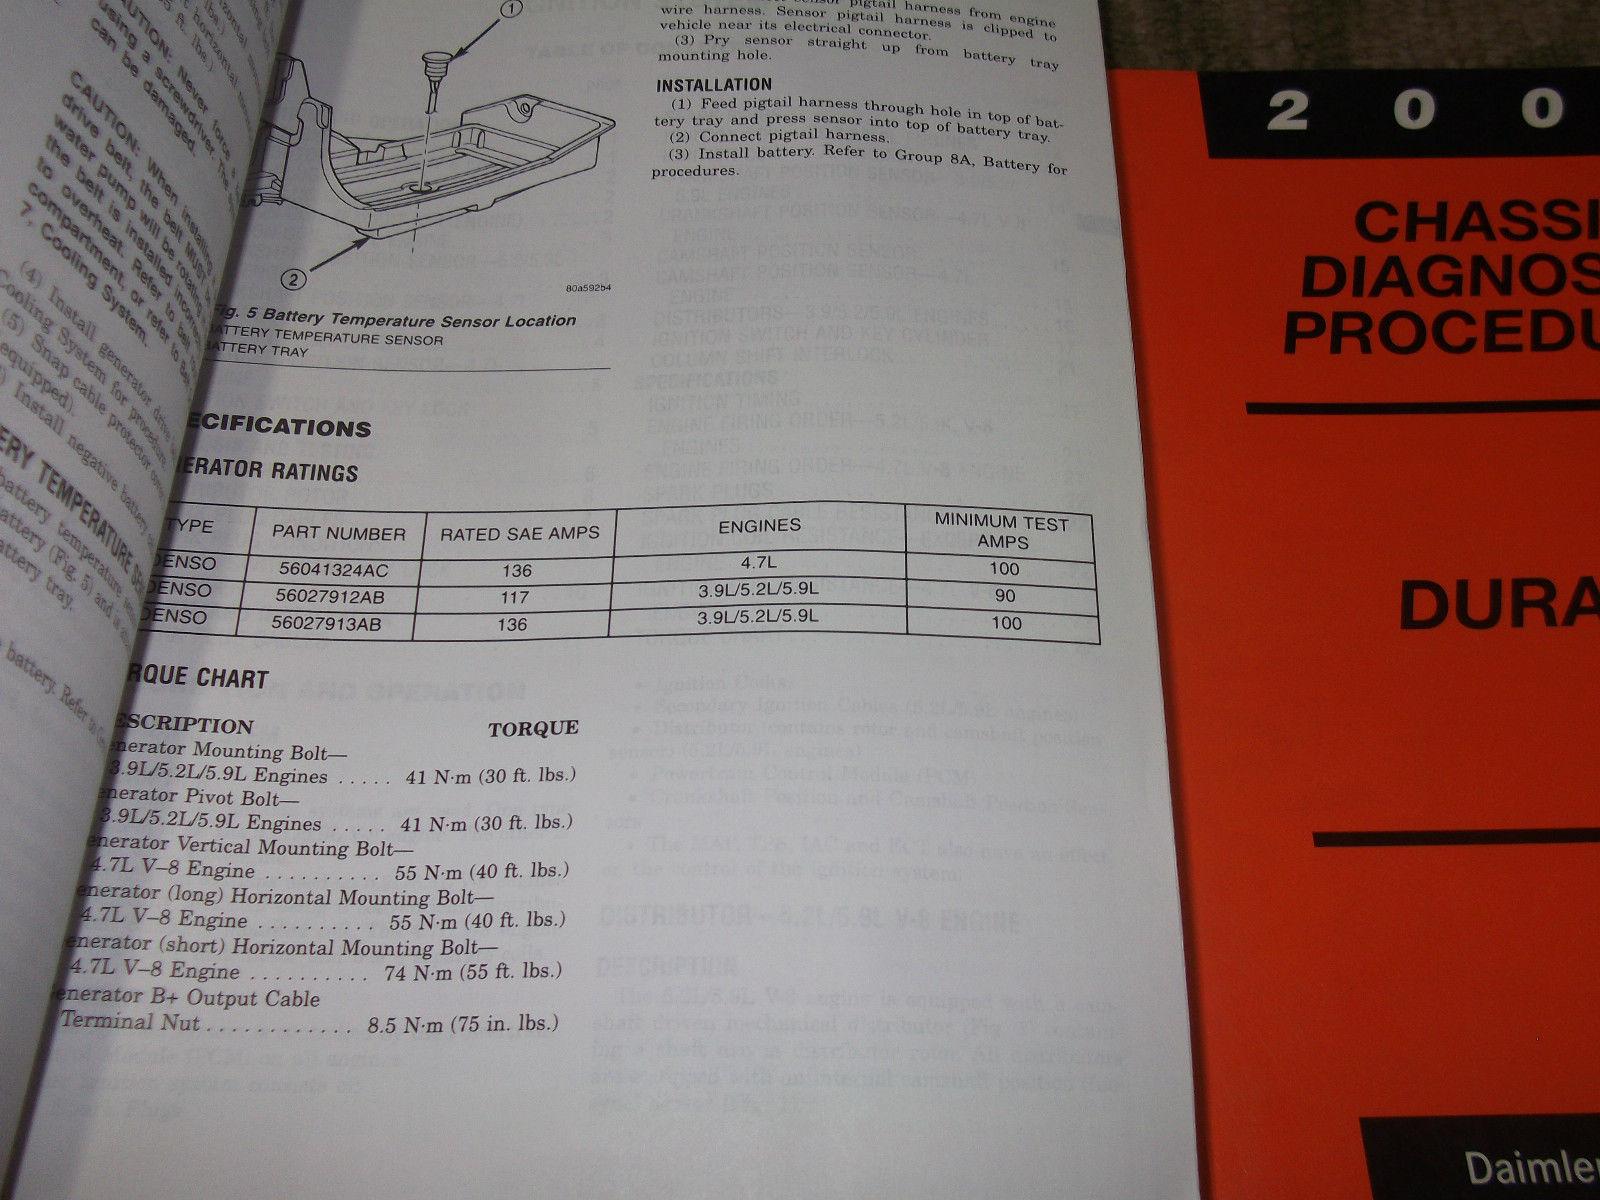 2000 Dodge Durango Service Repair Shop Manual Set OEM FACTORY DEALERSHIP BOOKS